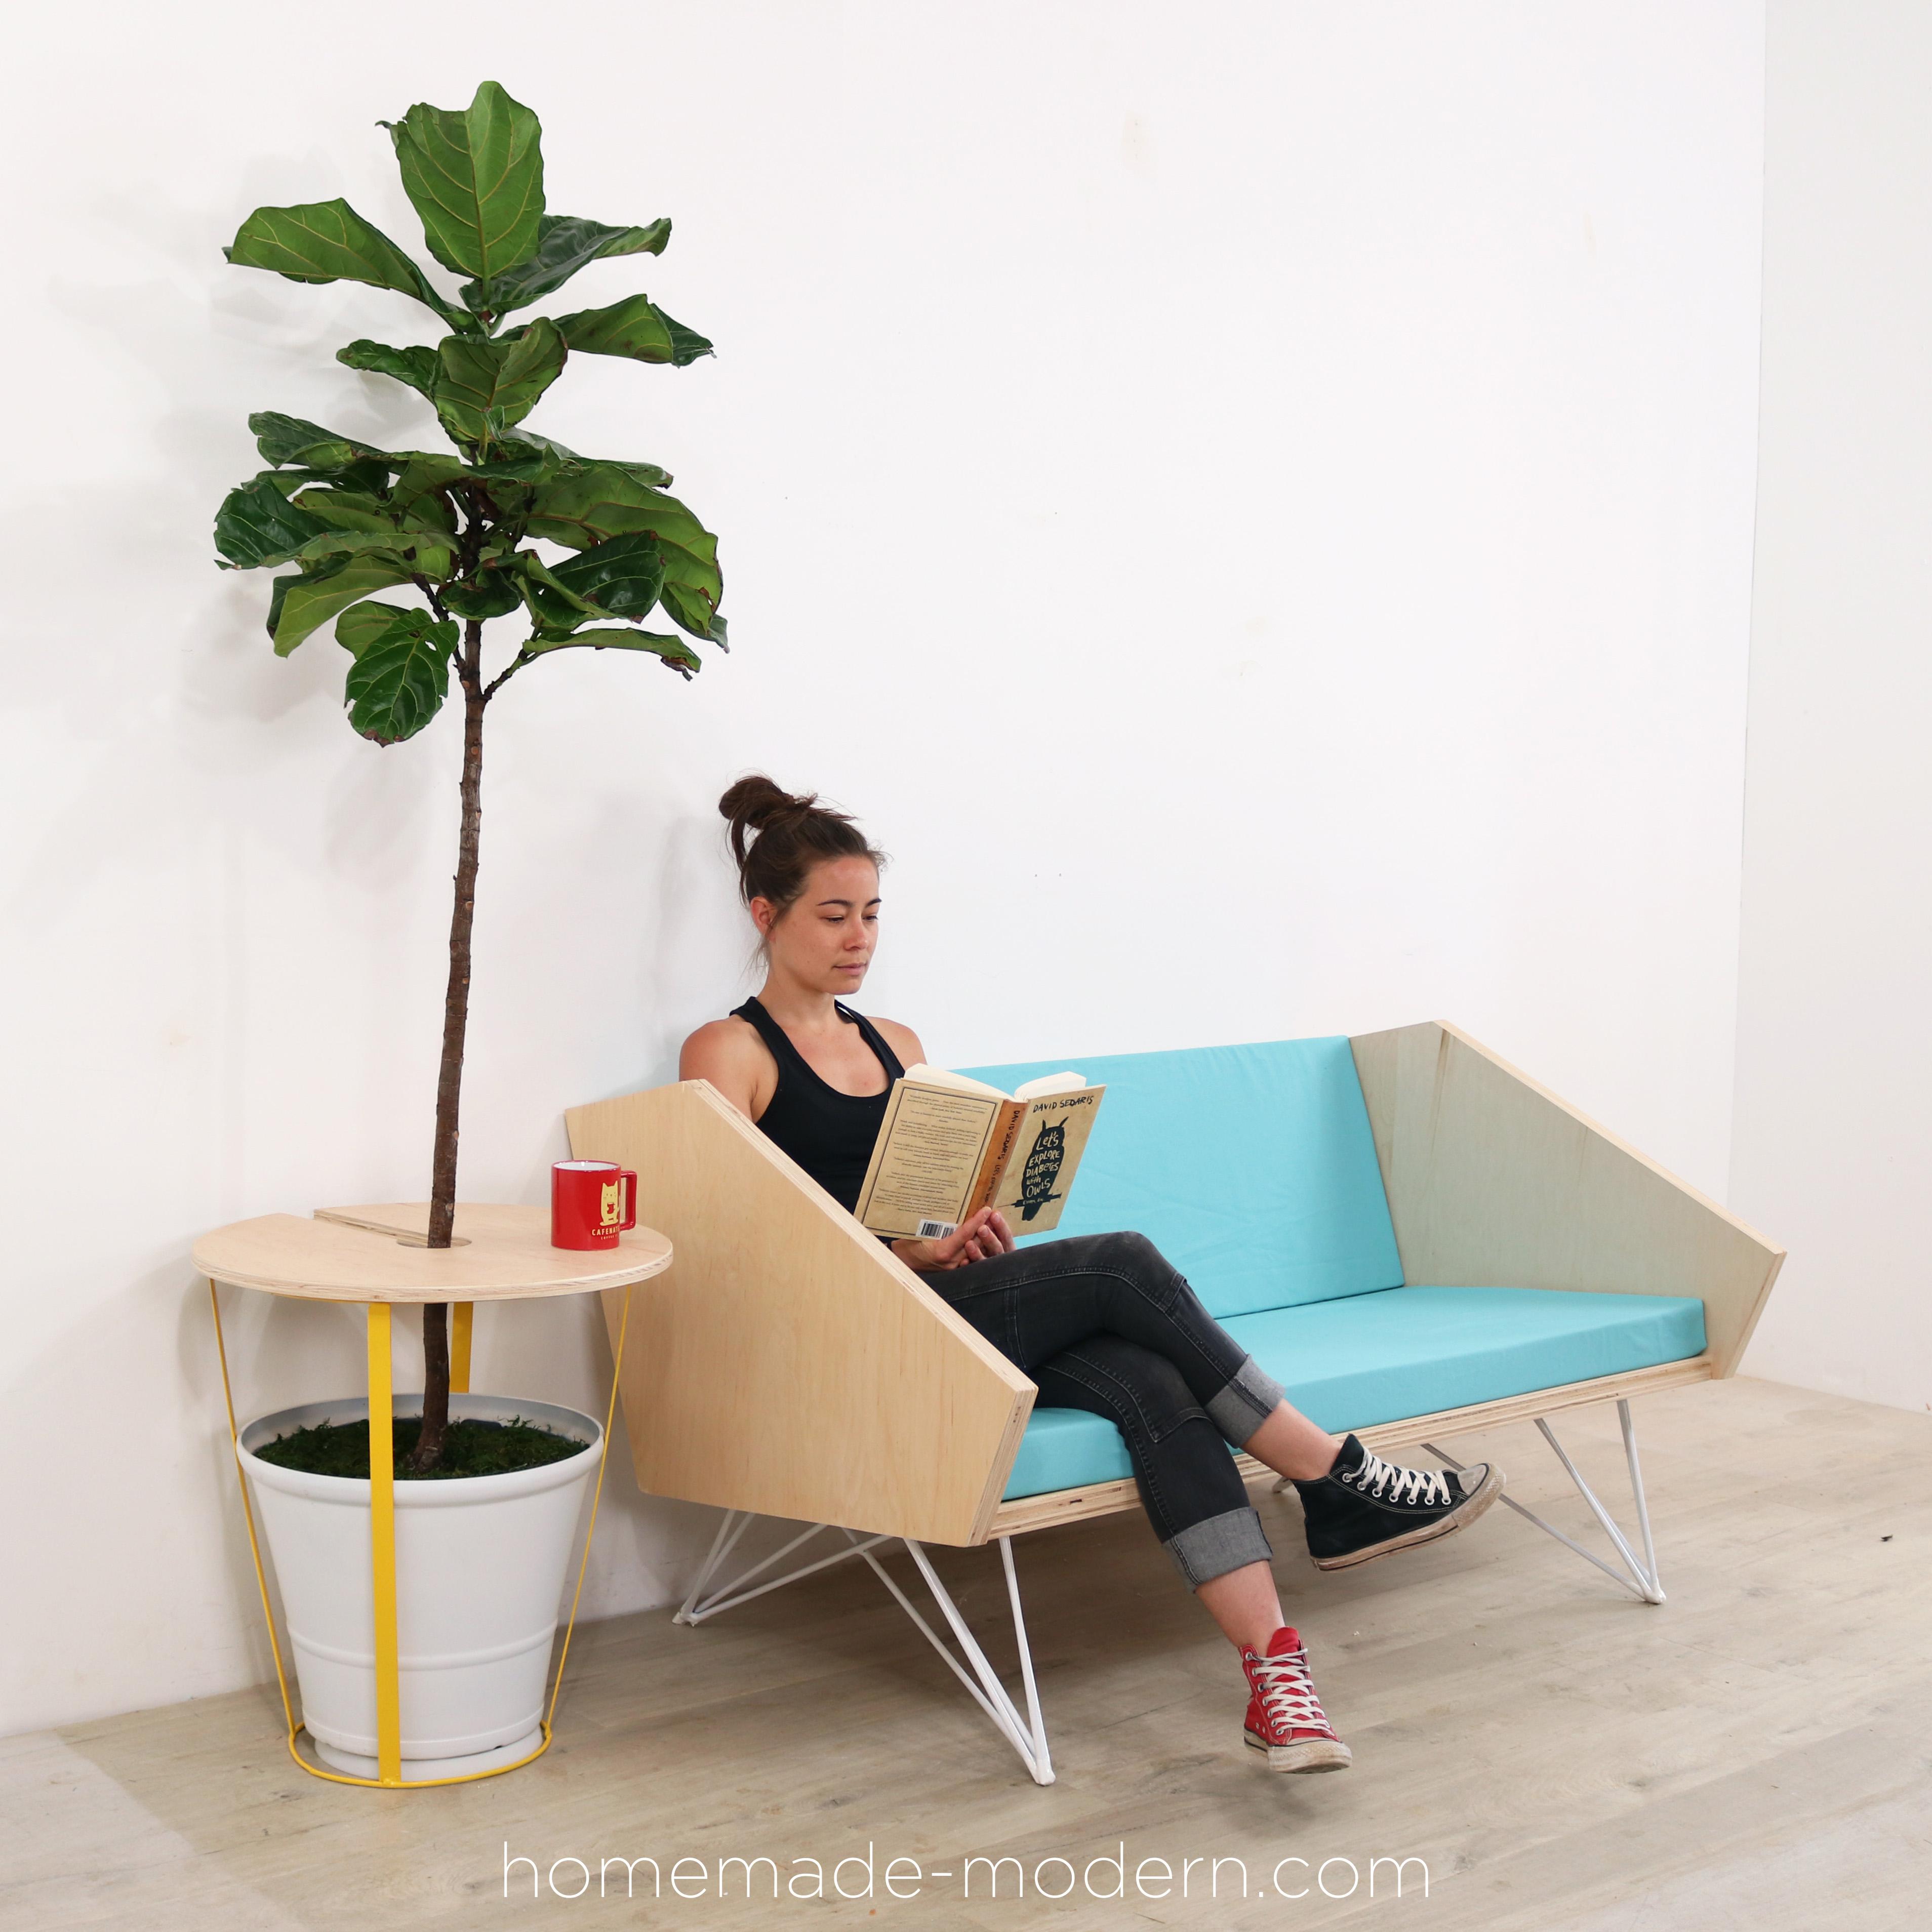 http://www.homemade-modern.com/wp-content/uploads/2019/05/plantersidetable-finaljess.jpg